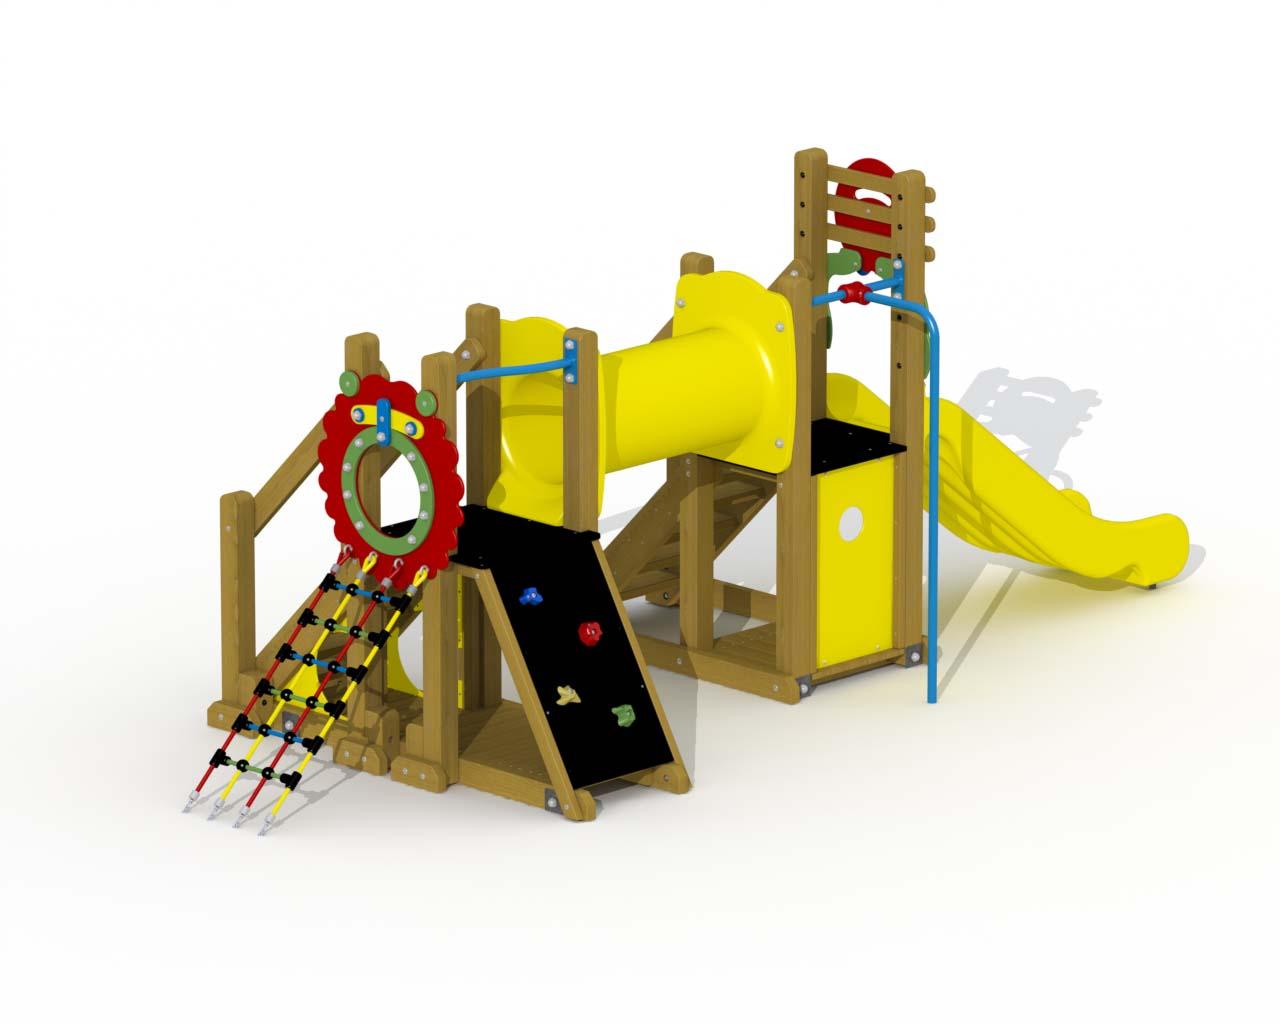 Mammoth (polymer Slide, Crawl Tunnel, Straight Fireman's Pole)